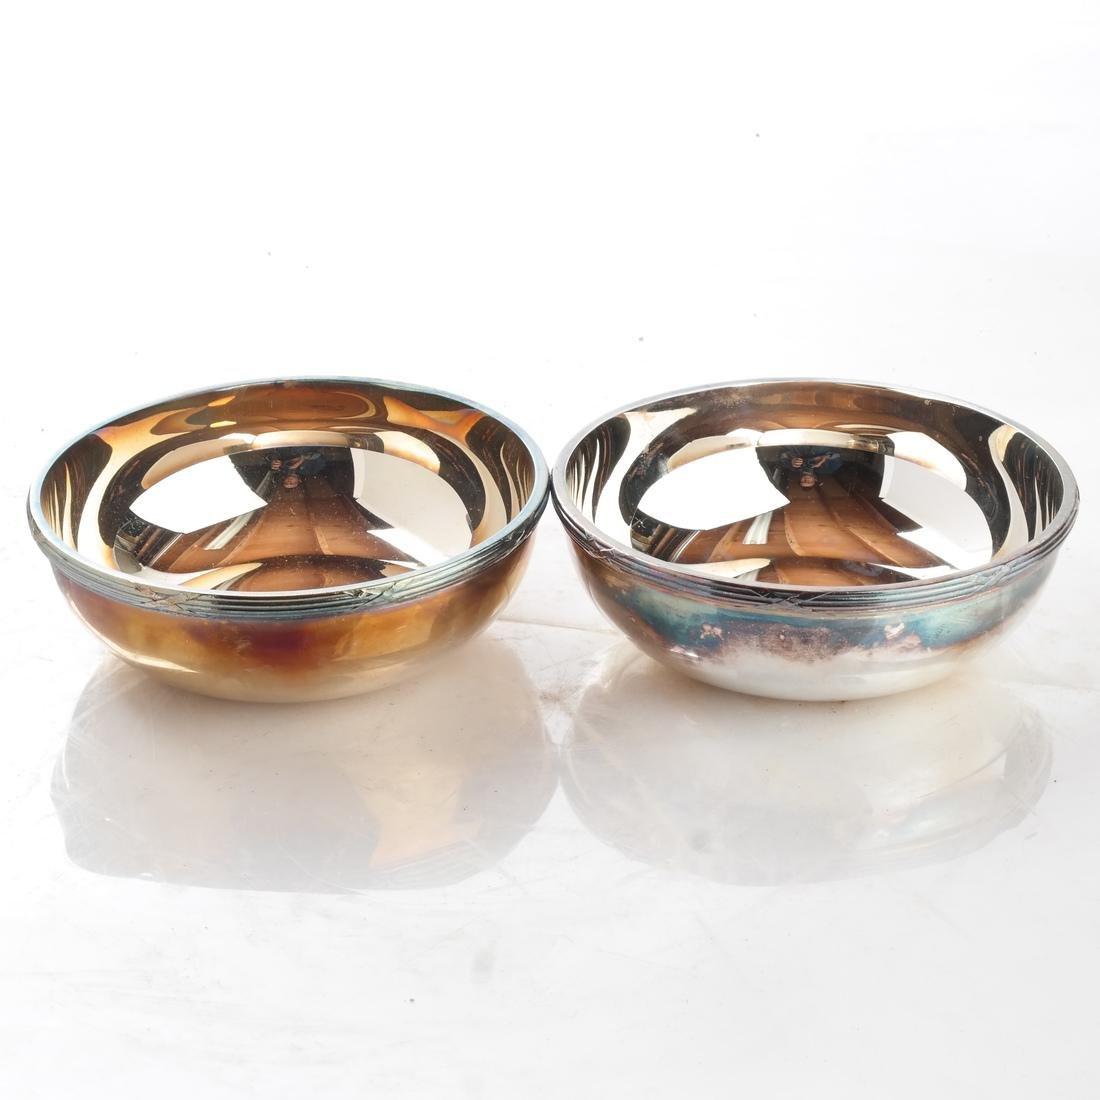 12 Christofle Silver Plate Bowls - 2